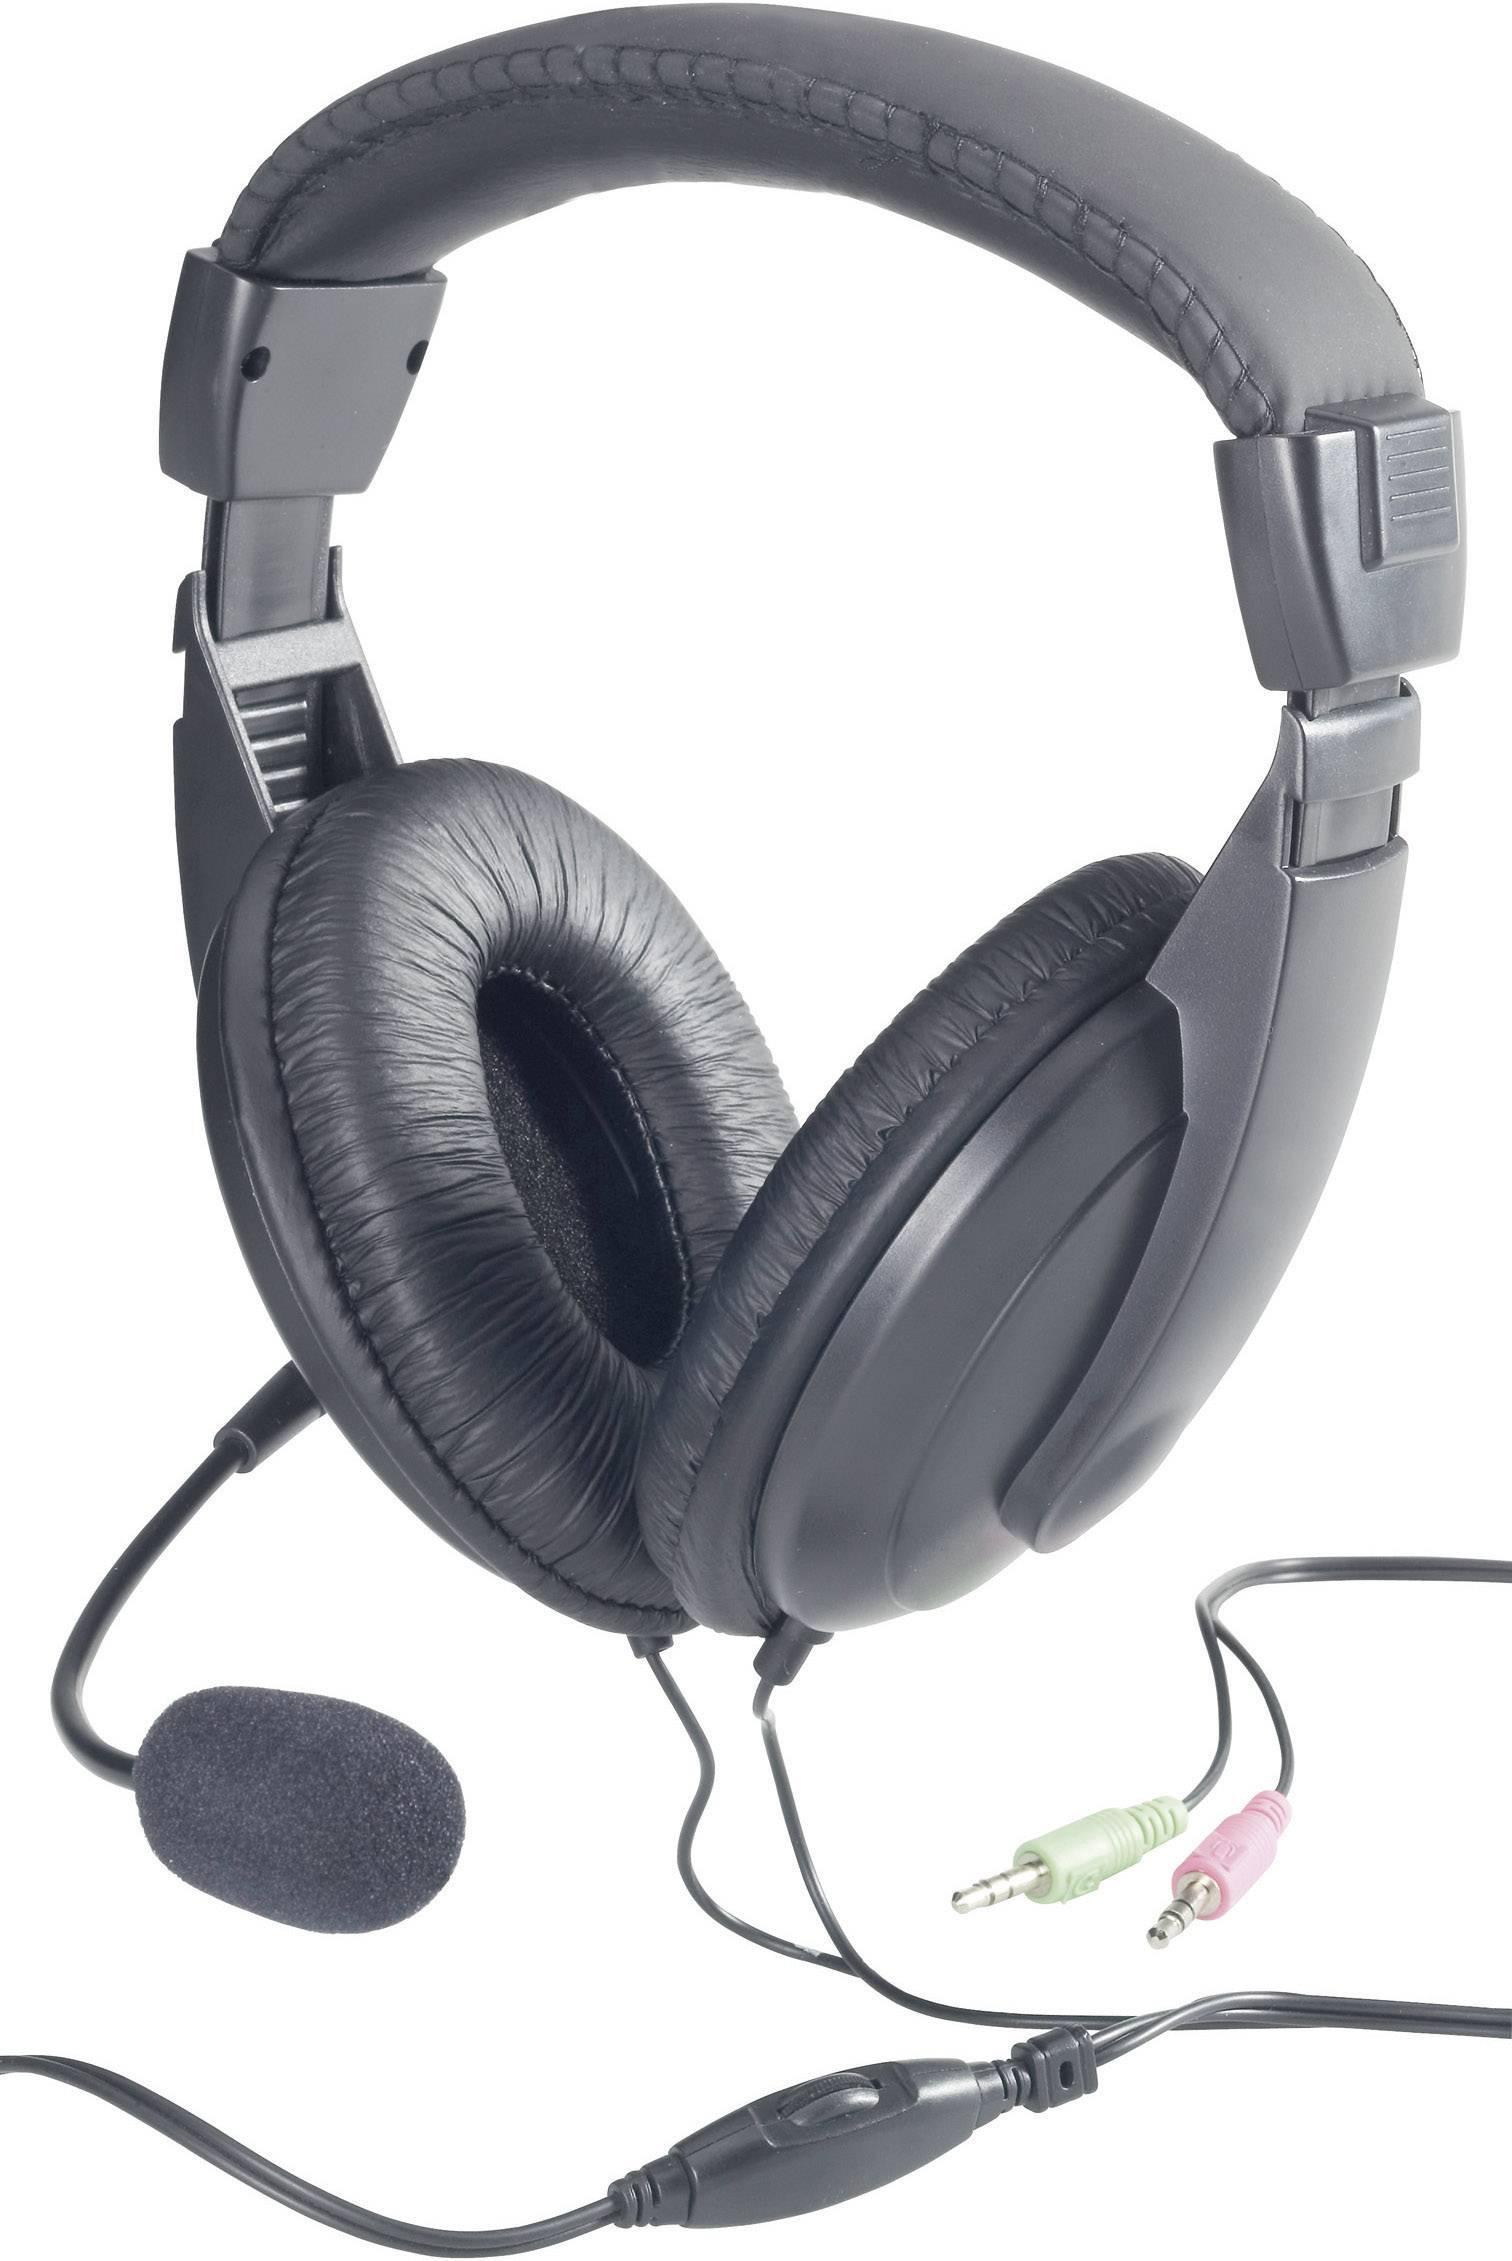 Stereo headset TW-260E